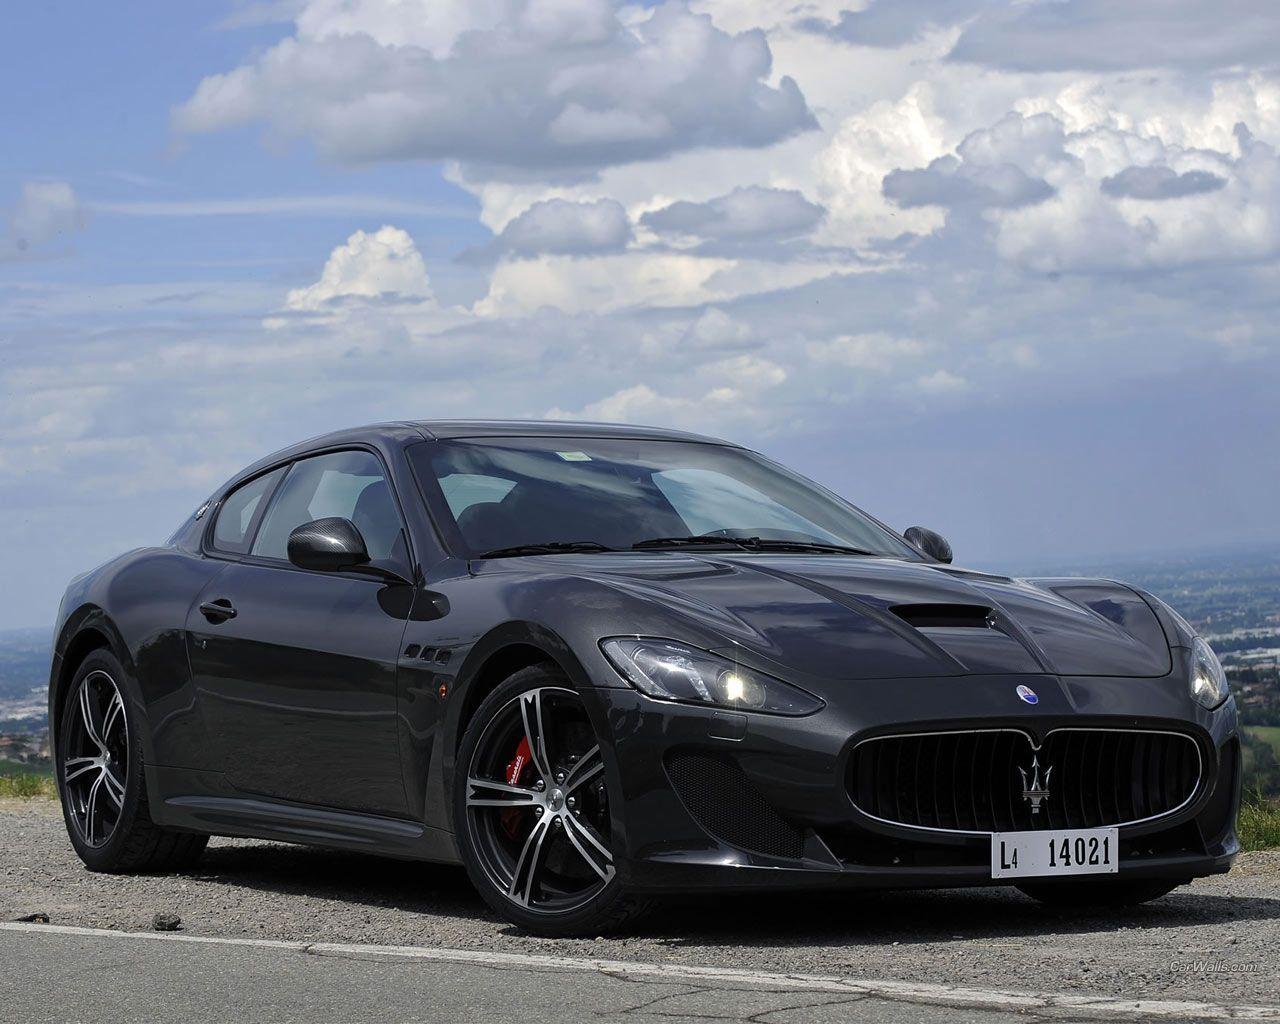 Maserati GranTurismo MC Stradale Maserati granturismo